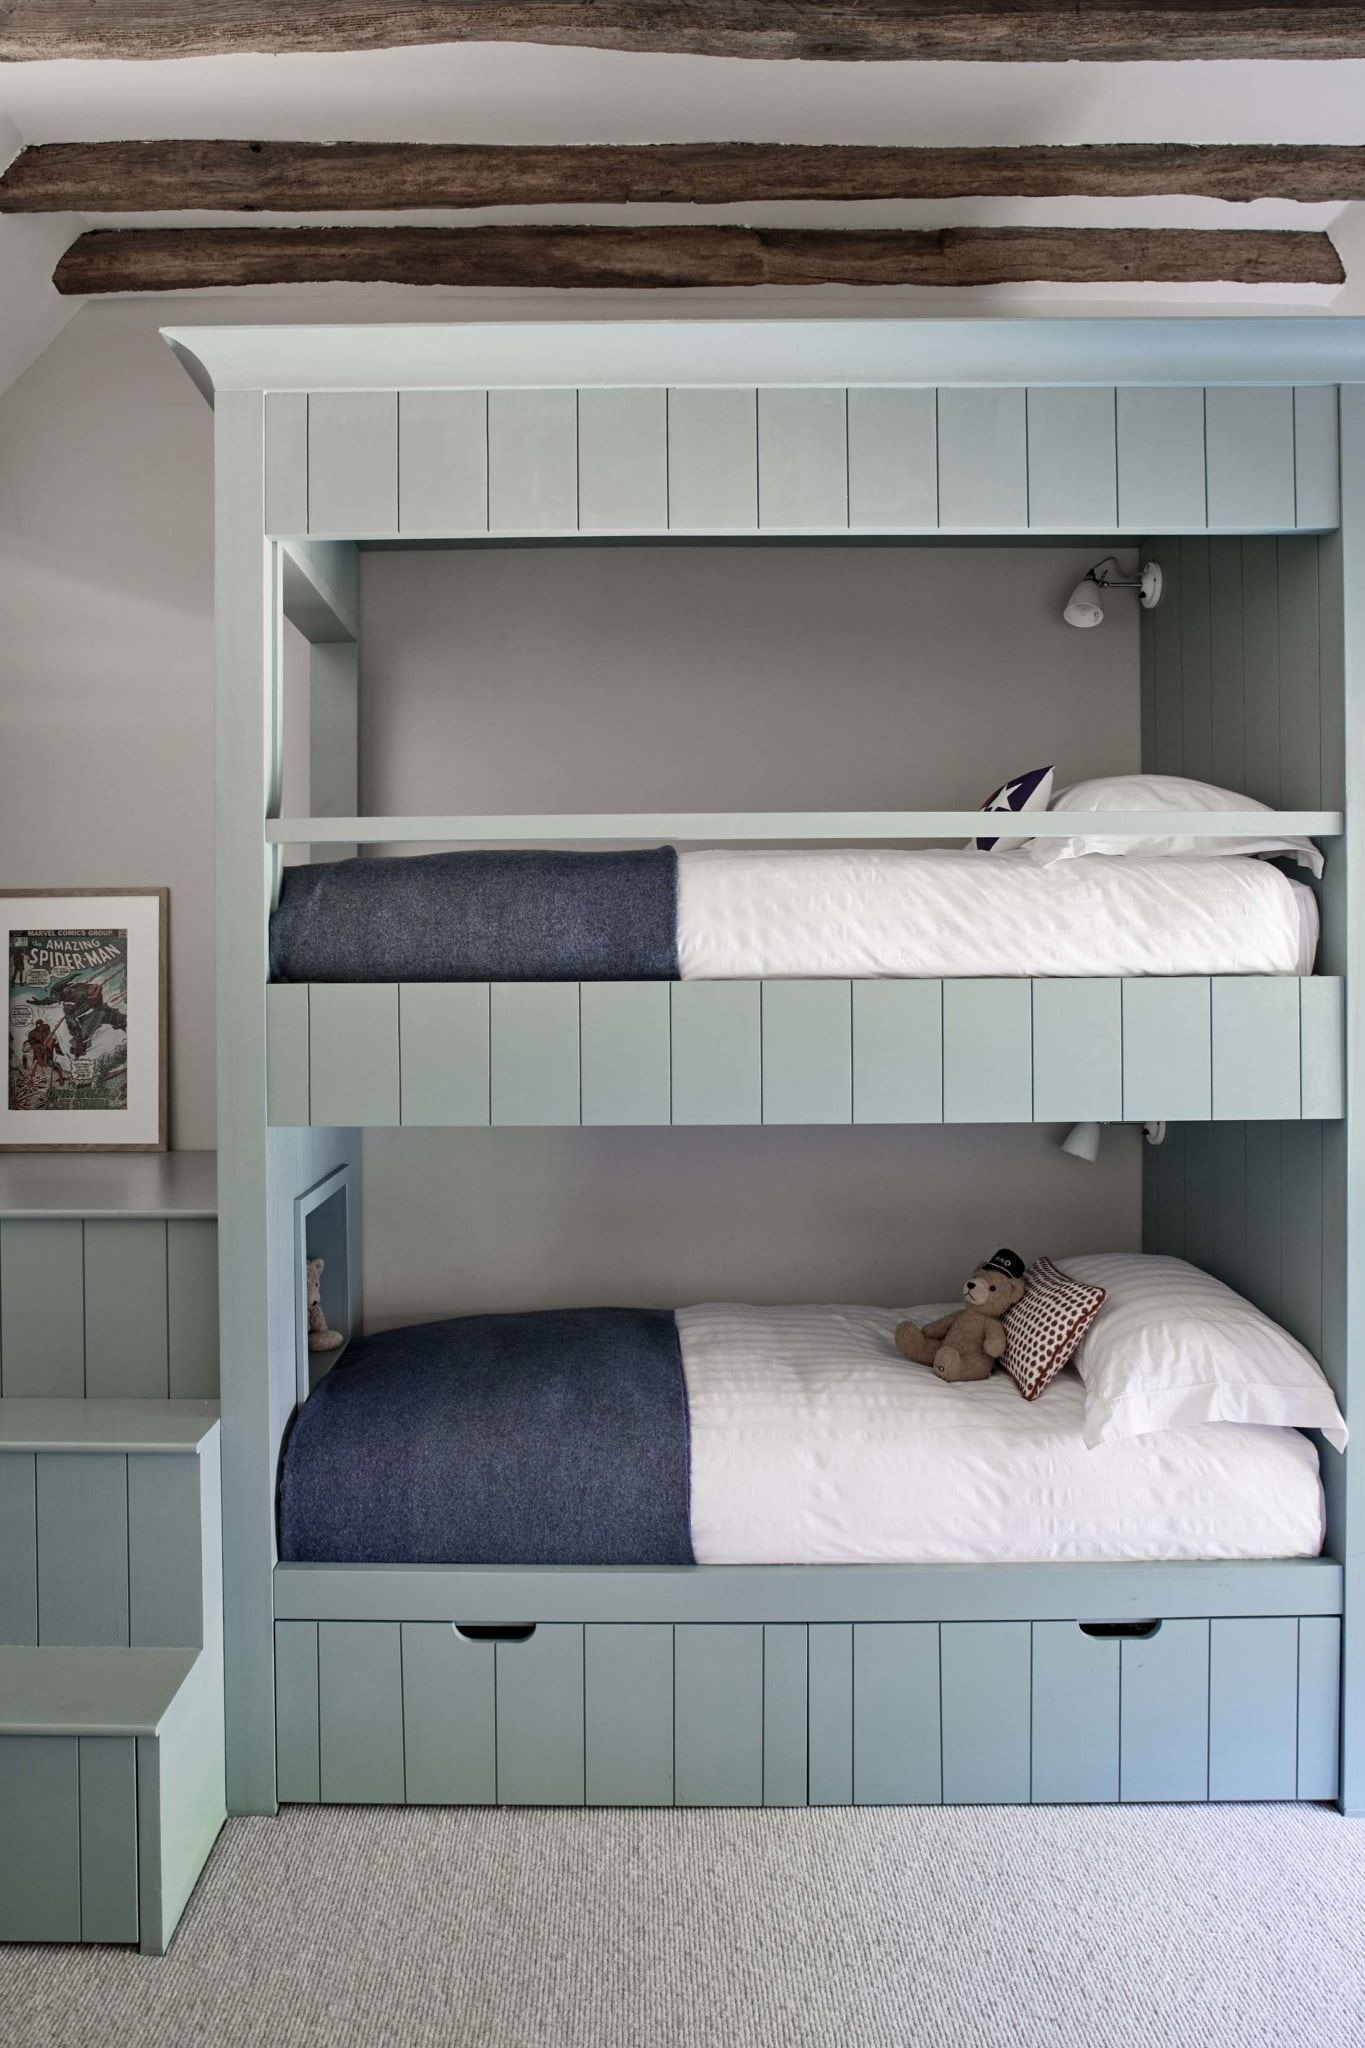 House Tour Sims Hilditch Designed Surrey Lake House Design Chic In 2021 Bunk Bed Designs Lake House Interior Bunk Beds